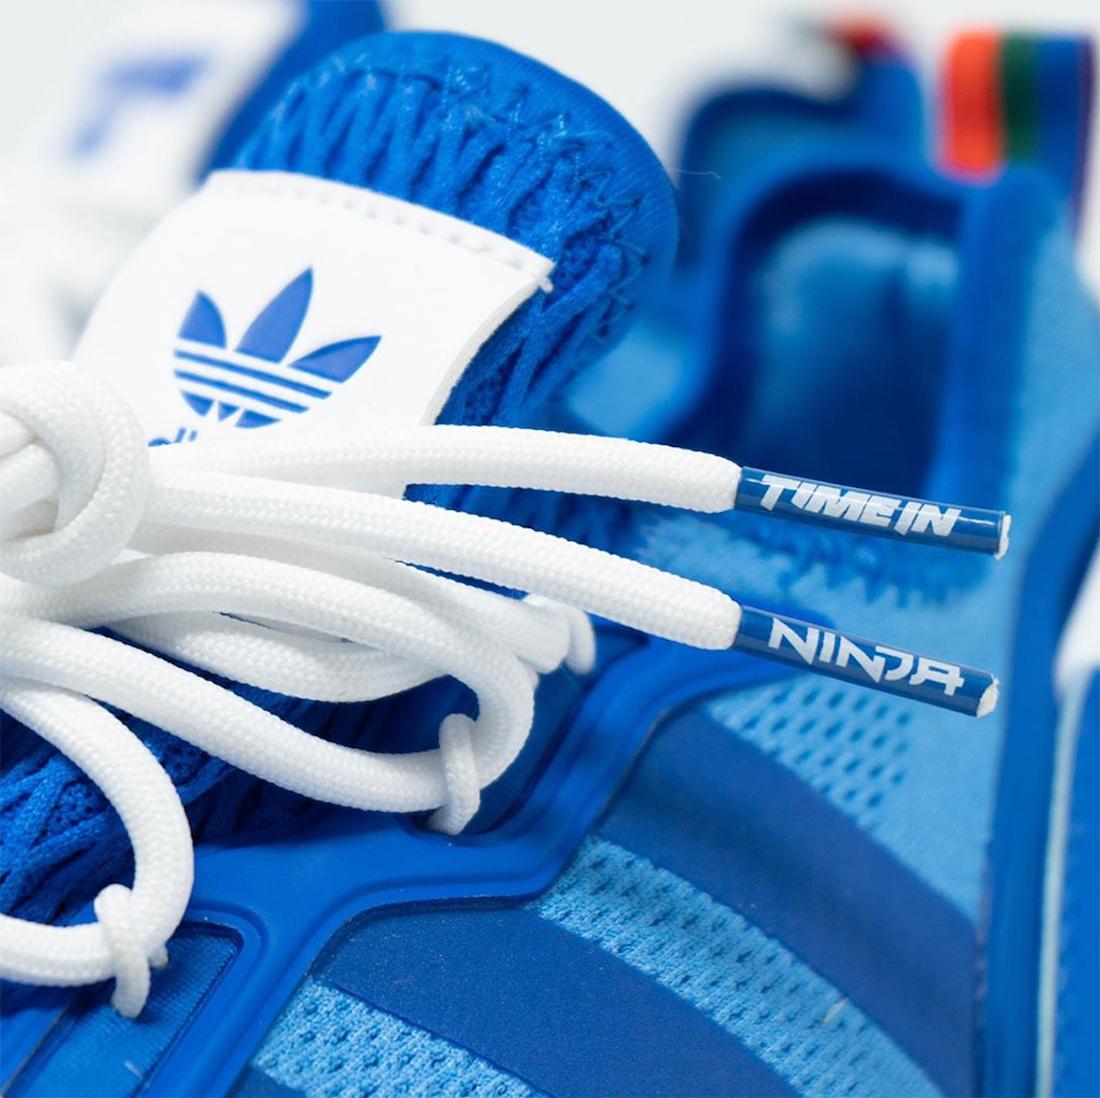 Ninja adidas ZX 2K Boost Hyper Blue FZ1883 Release Date Info